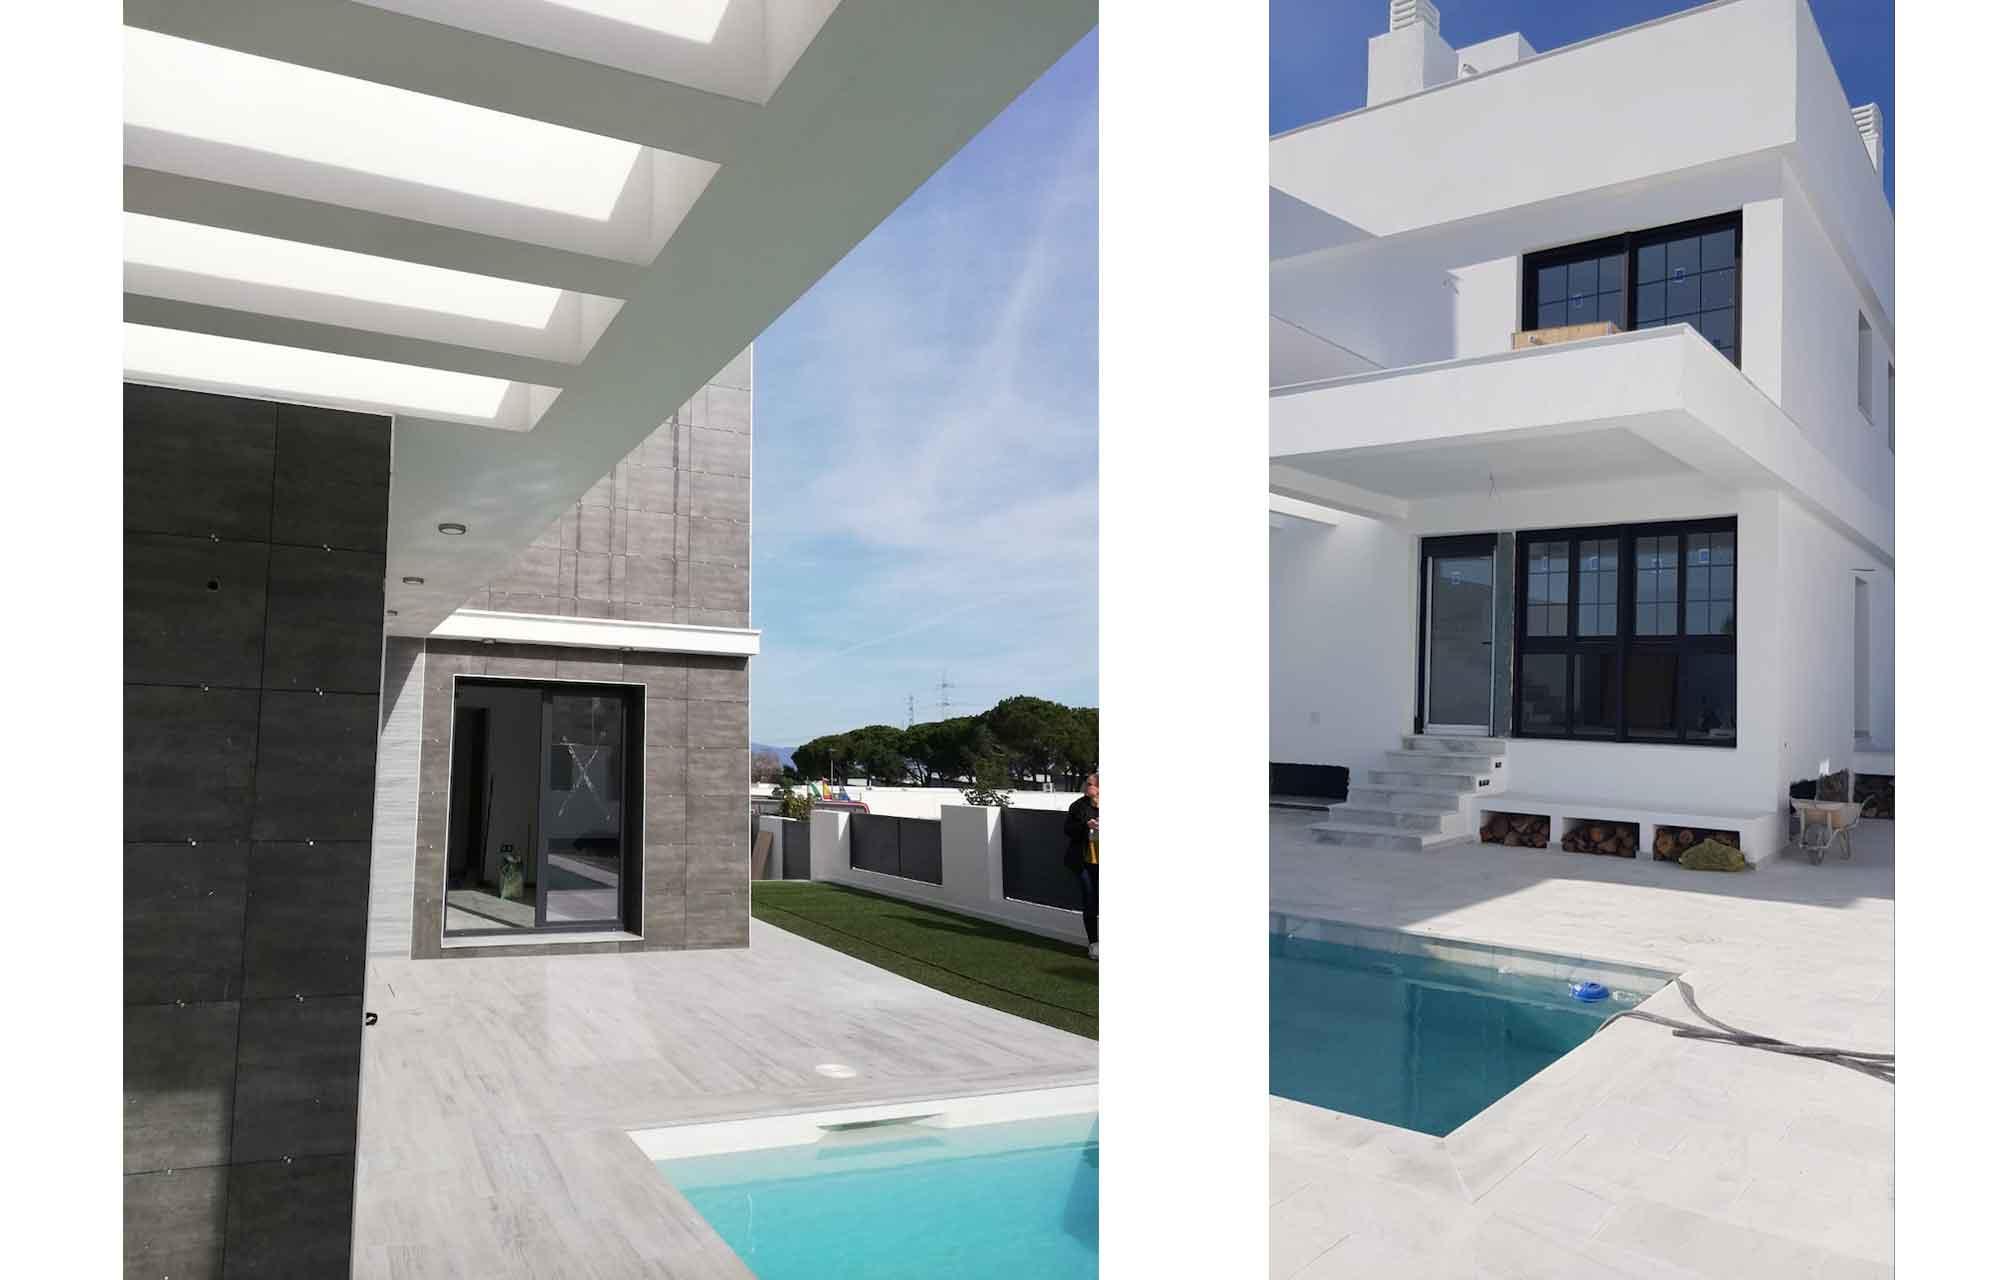 mejor arquitecto vivienda unifamiliar malaga